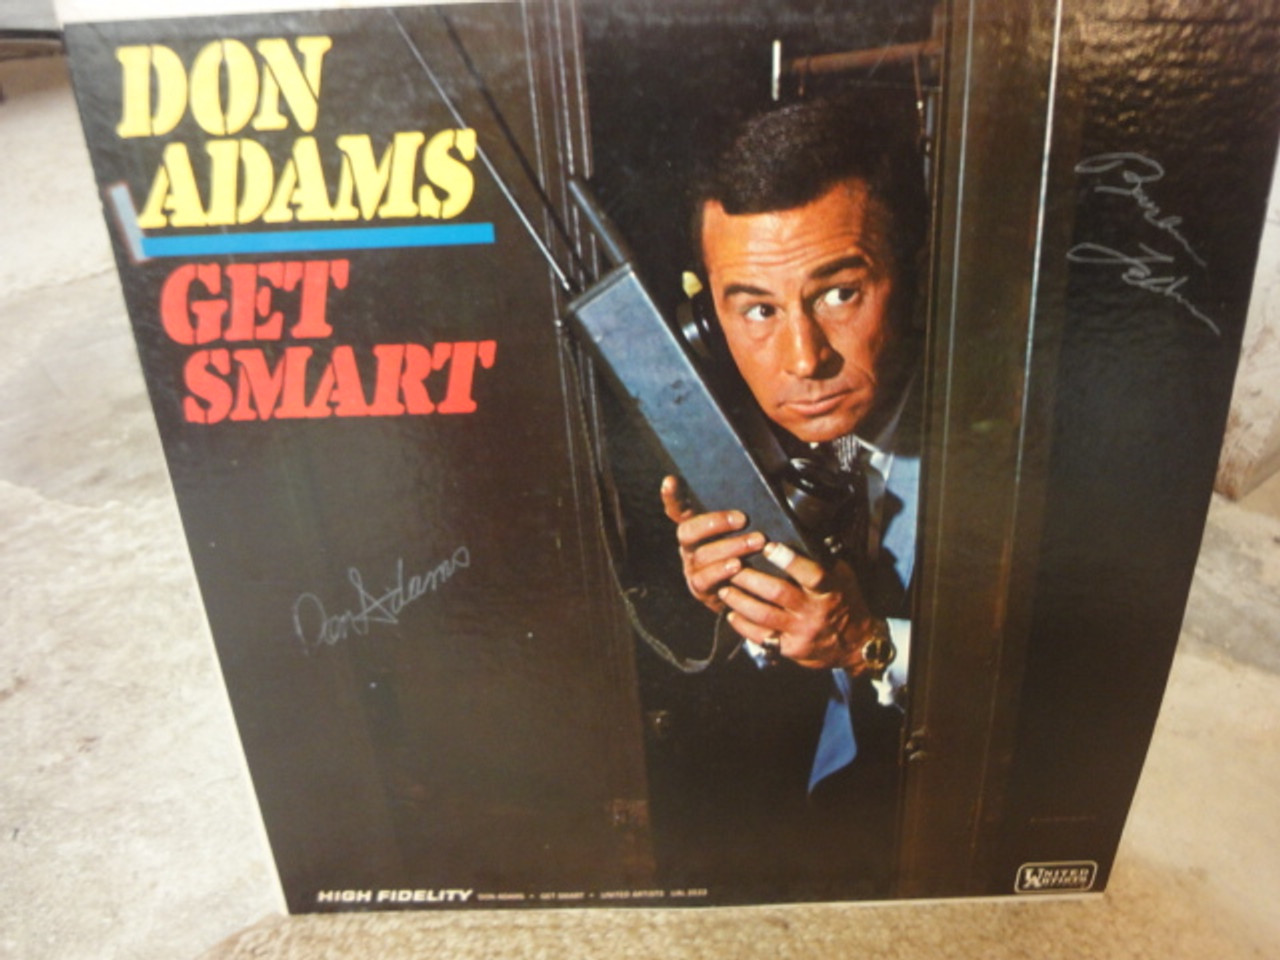 "Adams, Don and Barbara Feldon ""Get Smart"" 1965 LP Signed Autograph"